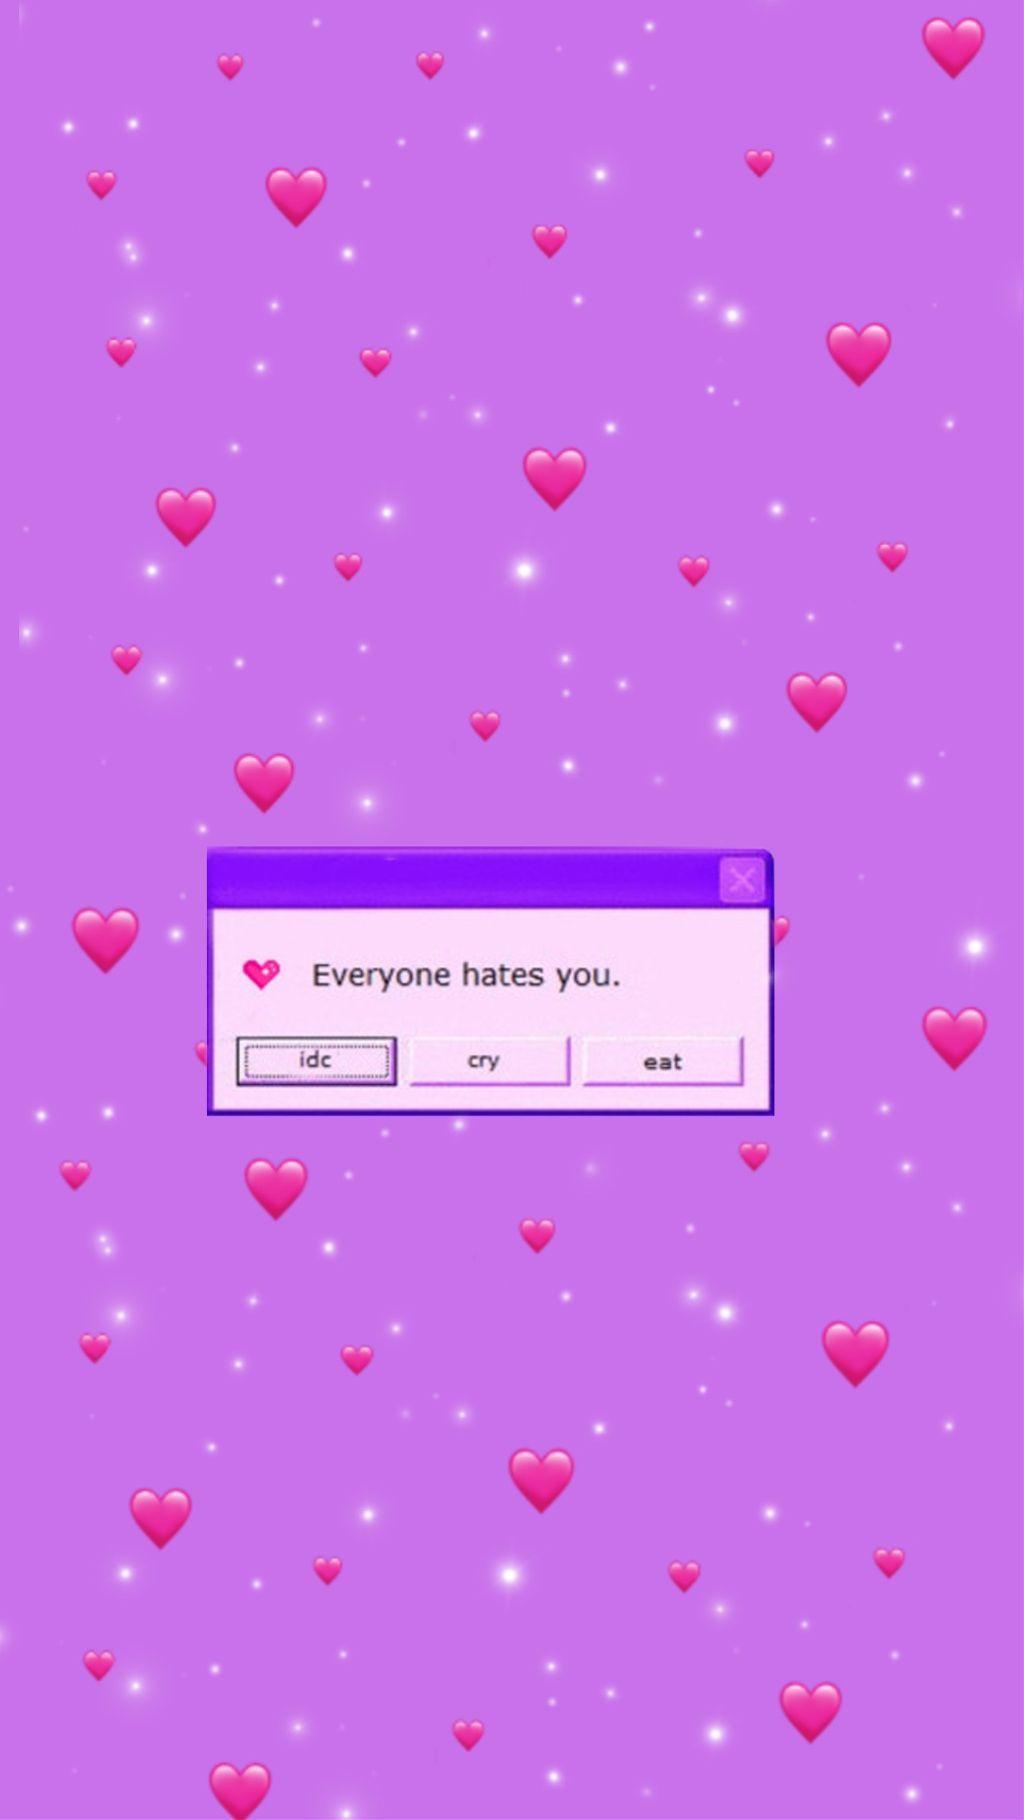 Oct 02, 2021· unowned roblox groups. Kawaii Pink Aesthetic Desktop Wallpapers on WallpaperDog